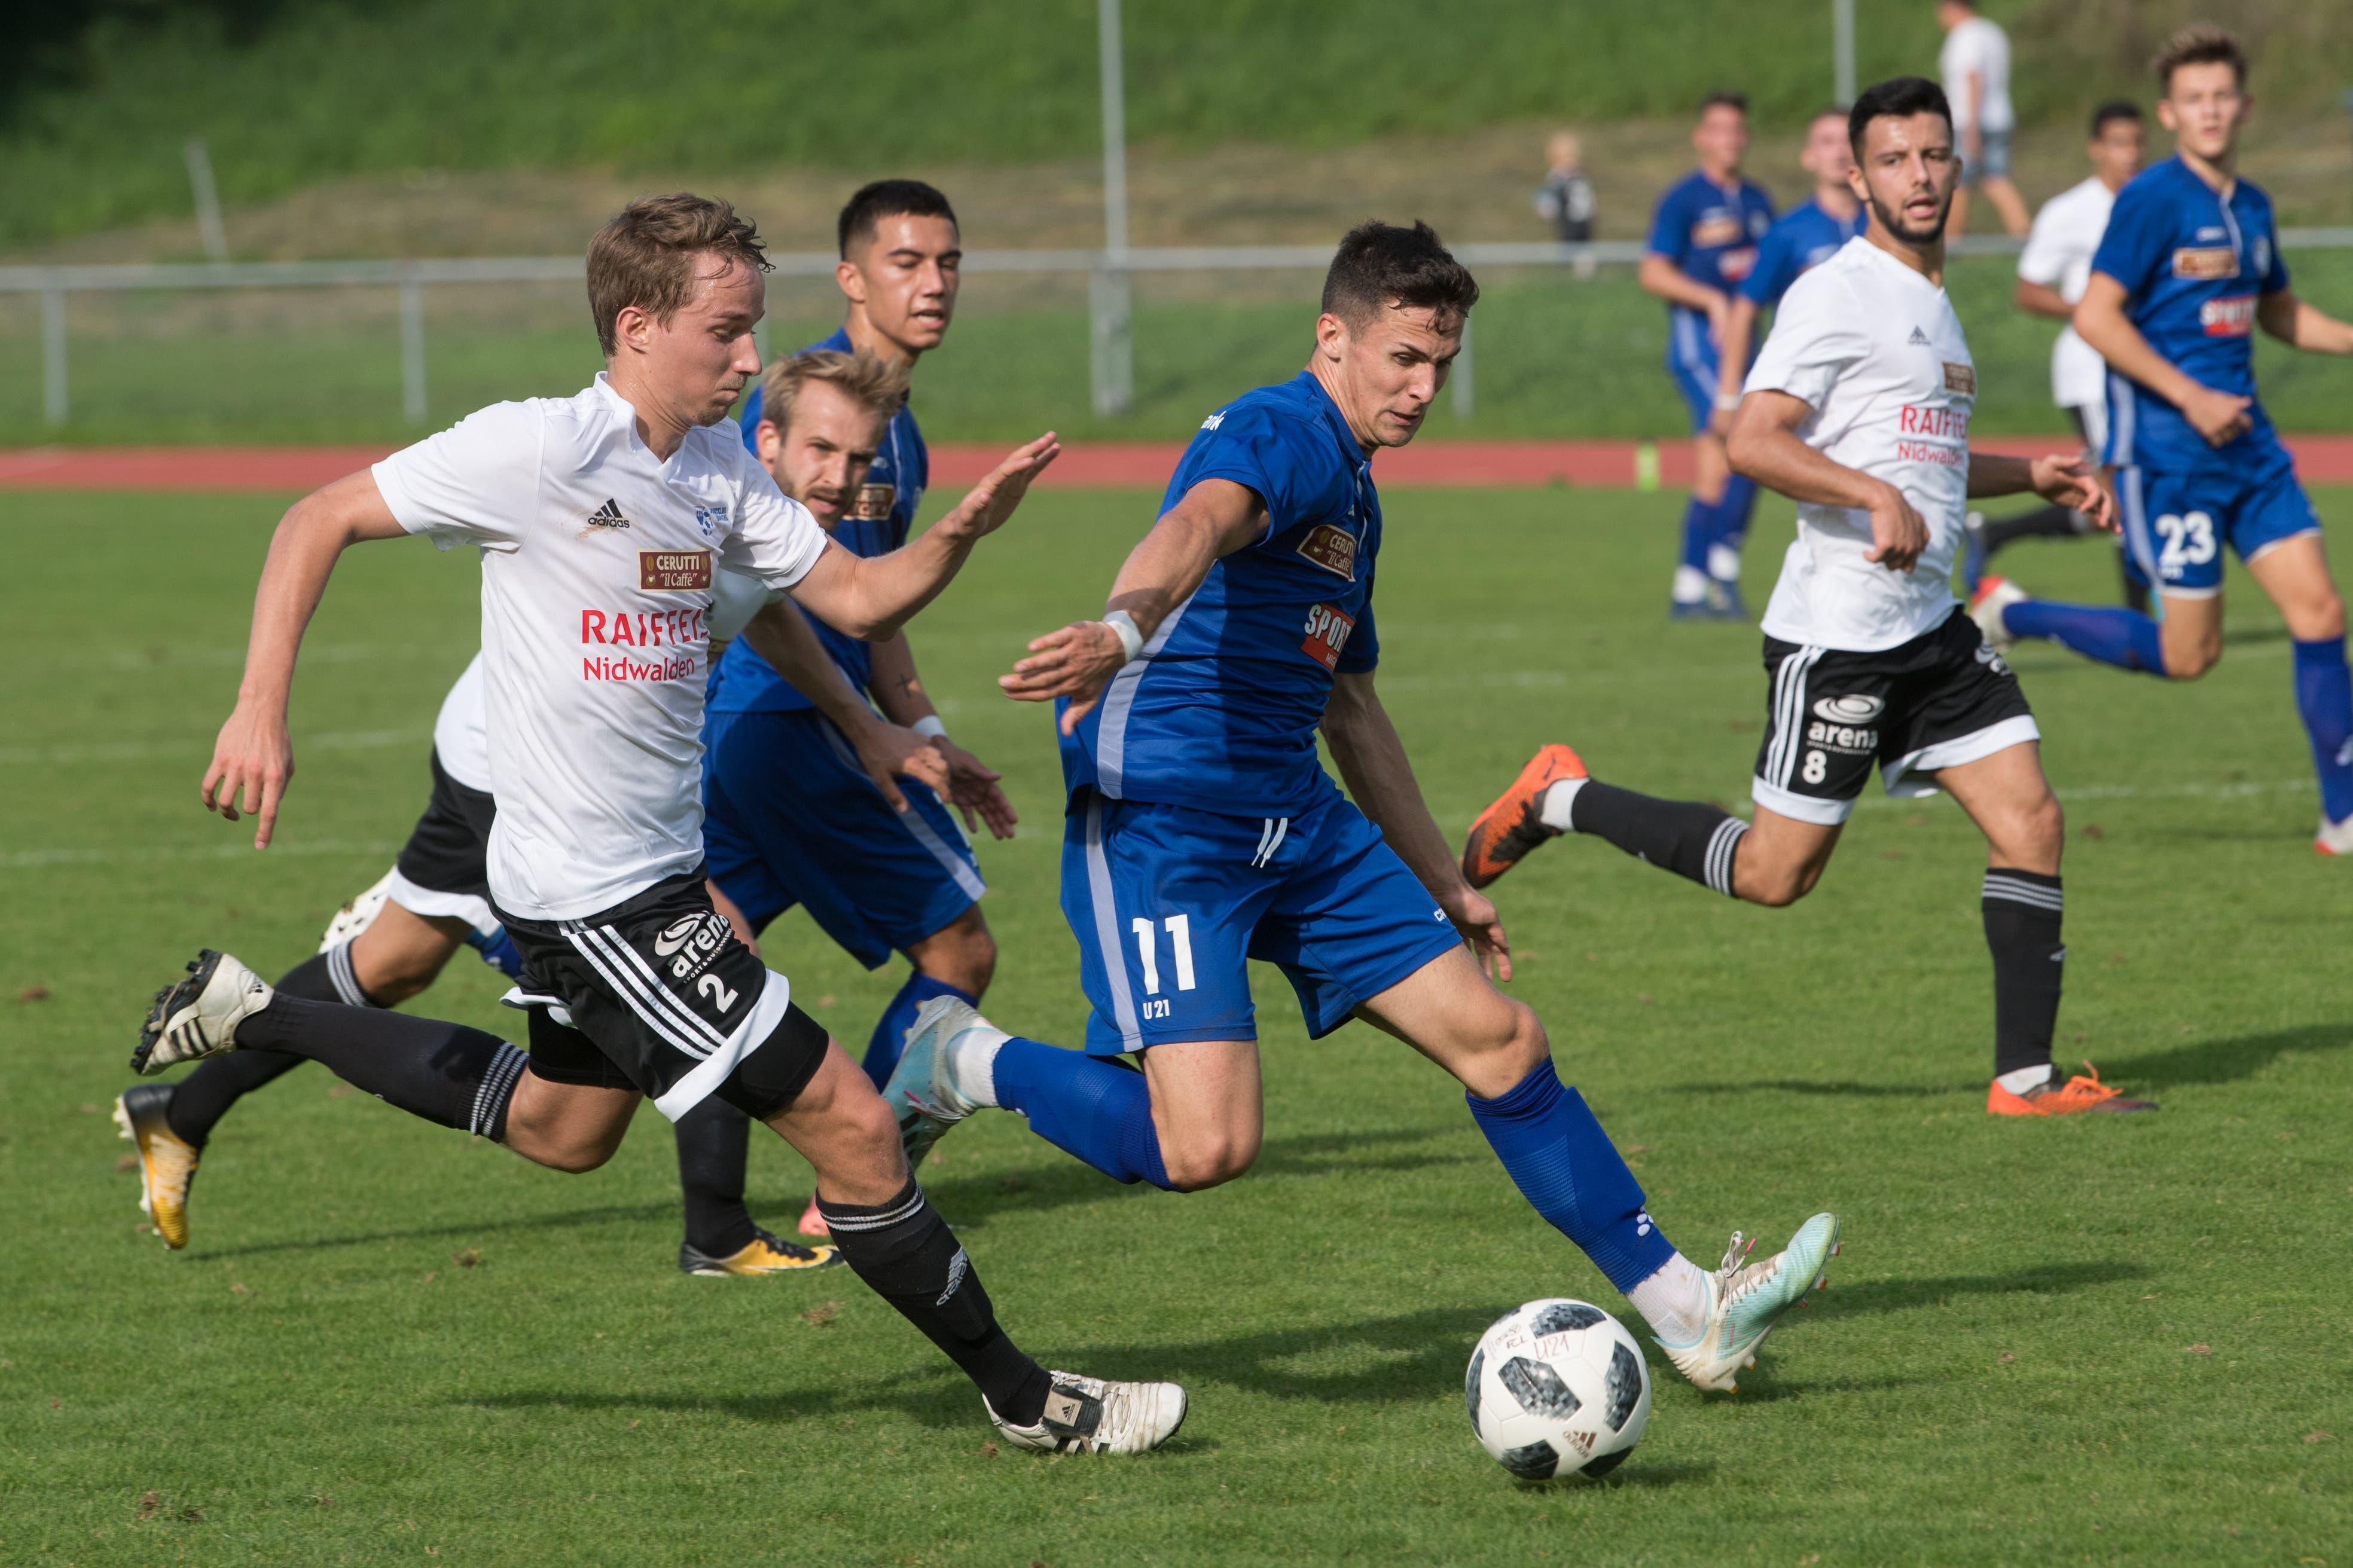 Der Buochser Gabriel Rico (vorne) gegen den Luzerner Lino Lang. (Bild: Boris Bürgisser, Luzern, 14. September 2019)